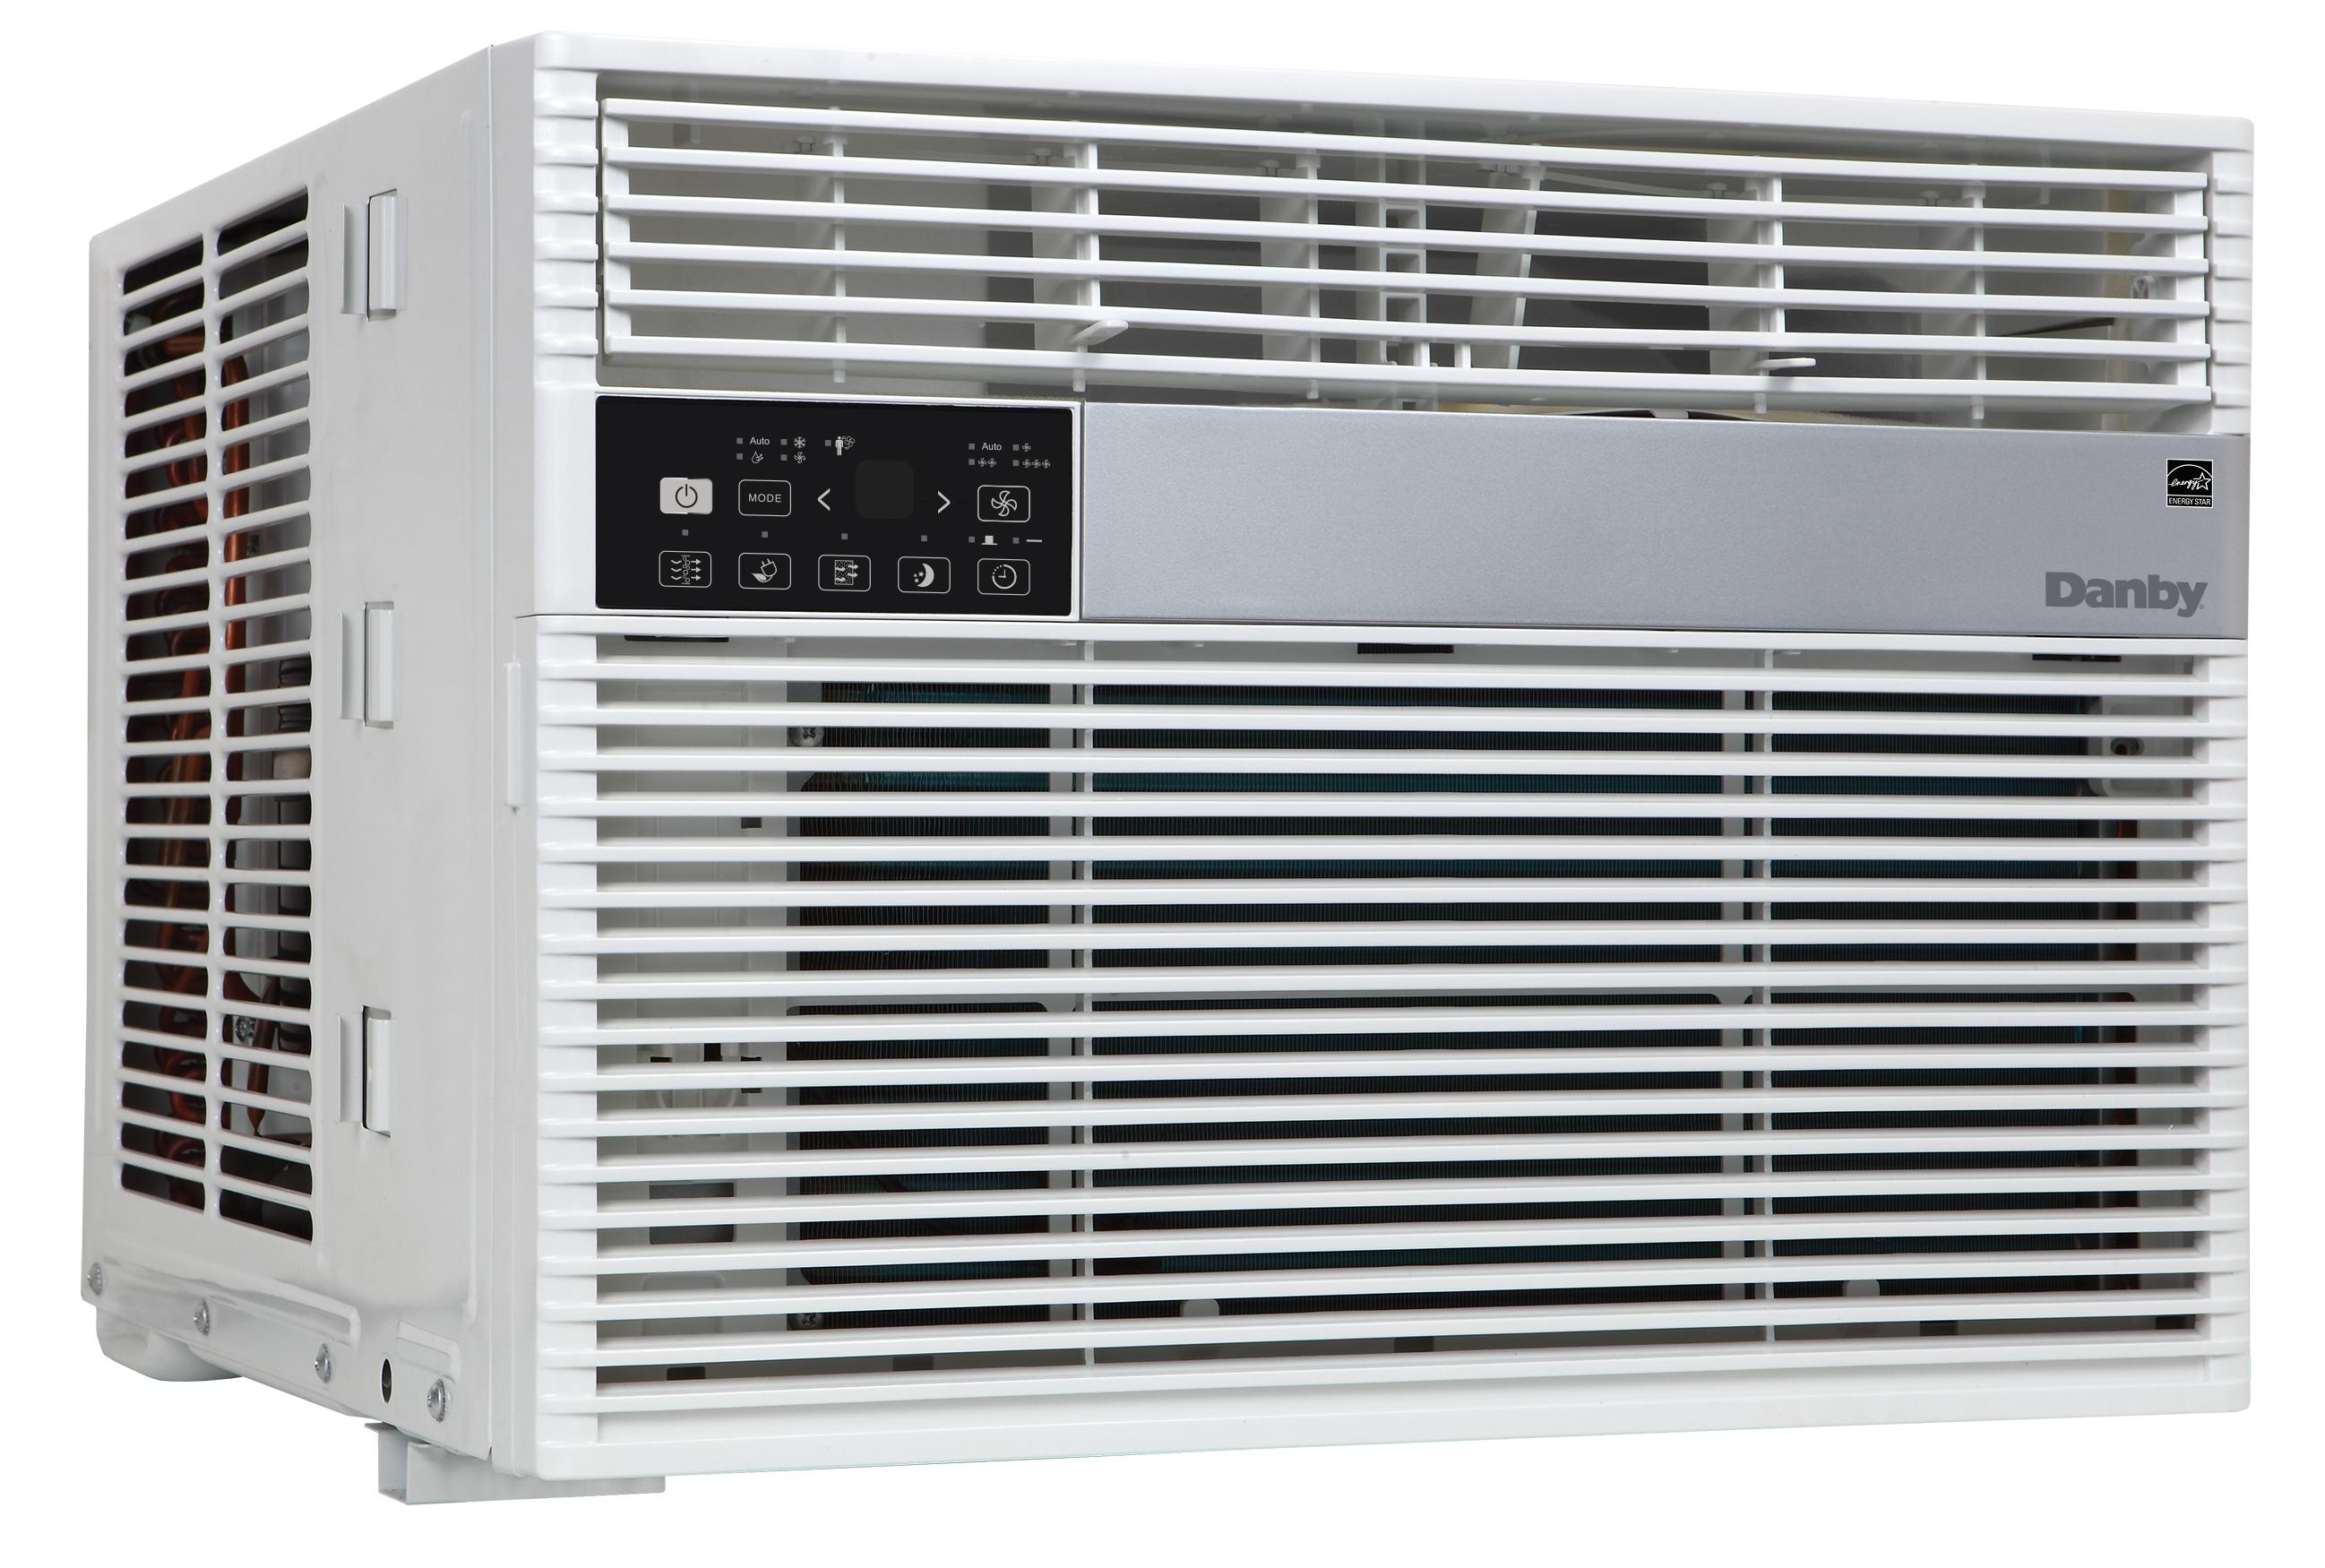 bosch split air conditioner model 5000aa remote manual